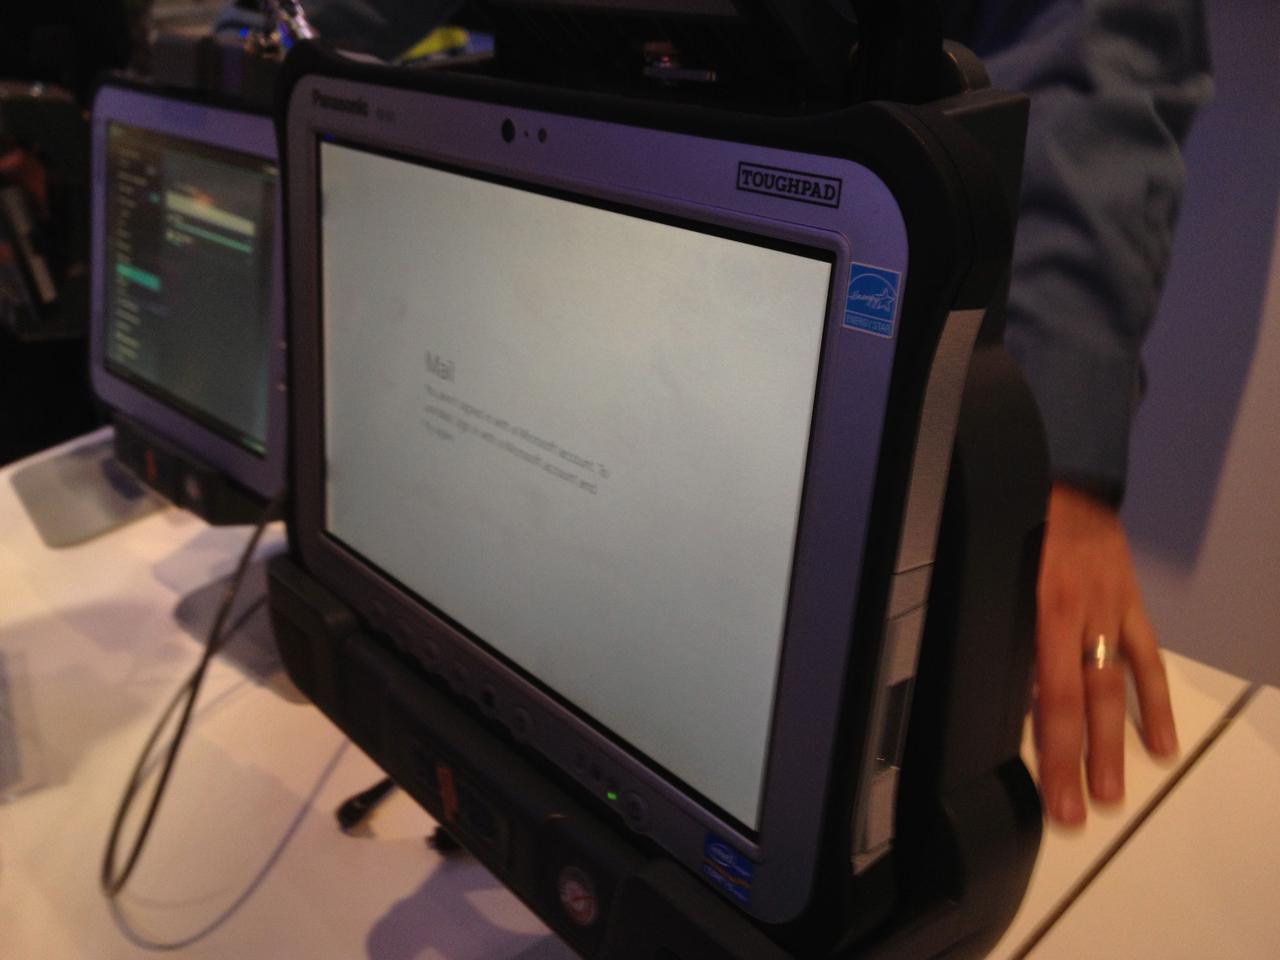 The Panasonic Toughpad on the show floor